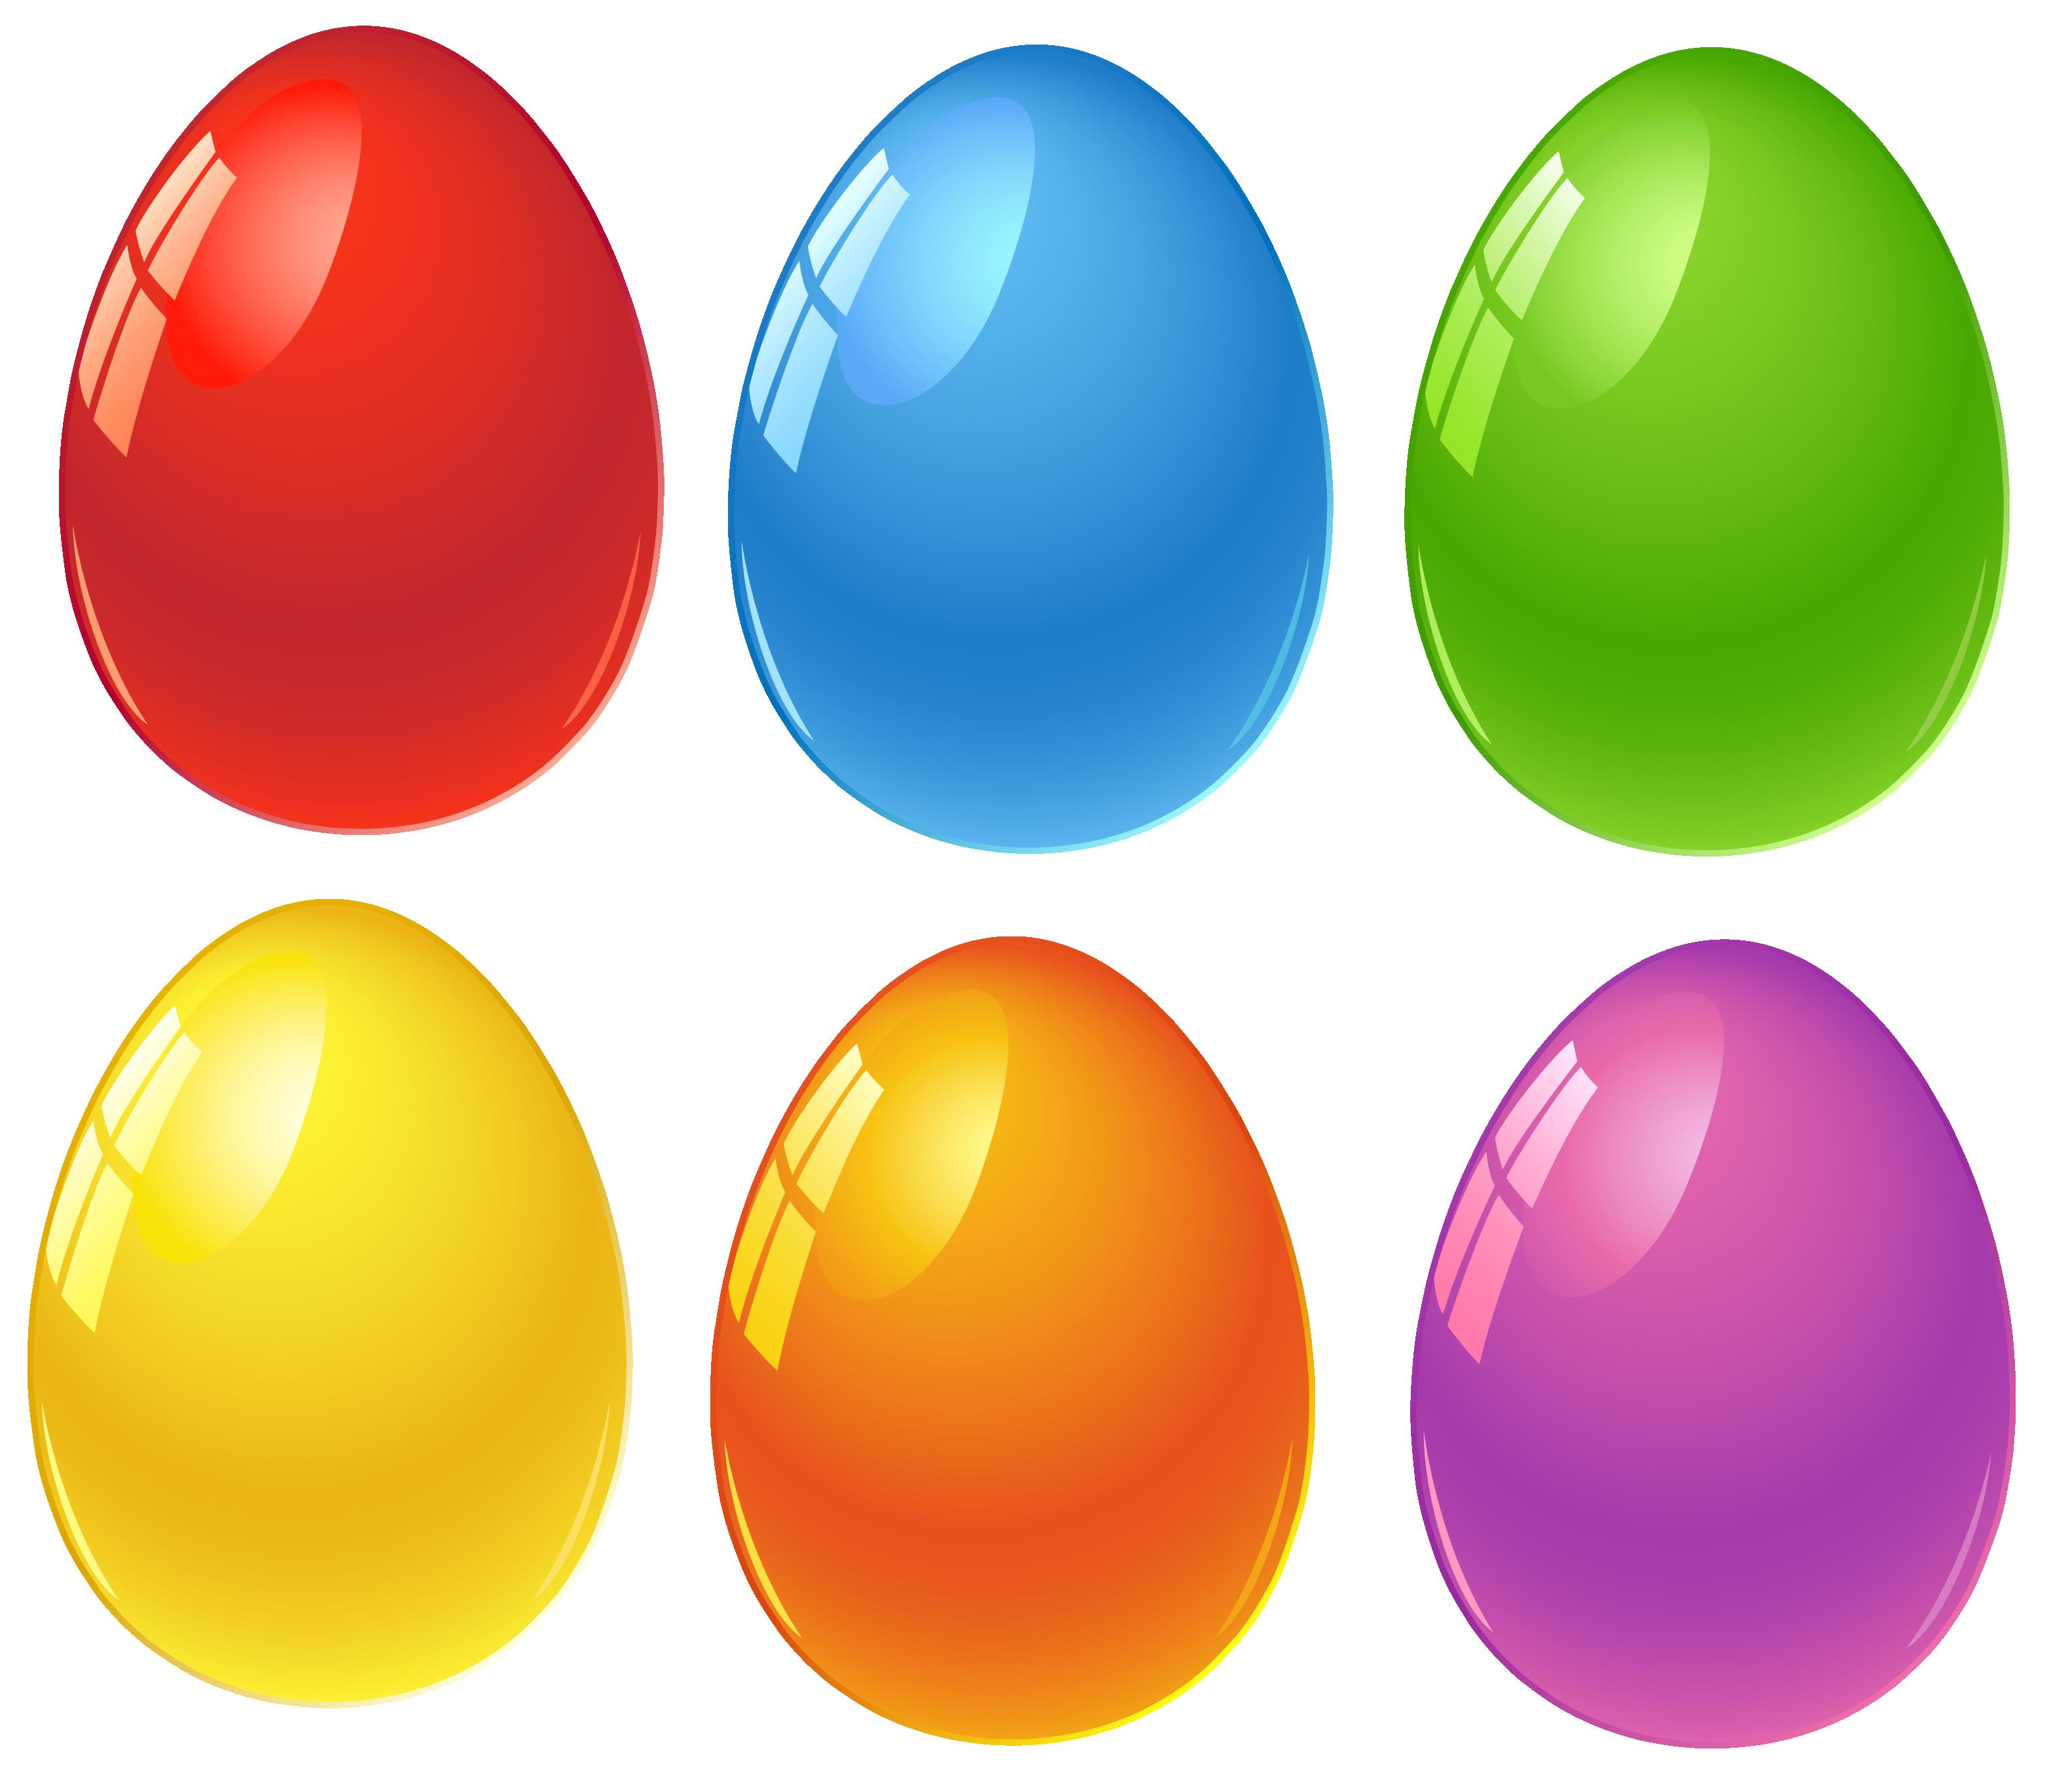 Free easter egg clip art clip art royalty free stock CLIPART PASQUA | 52 Free Easter Egg Clip Art - Cliparting.com ... clip art royalty free stock